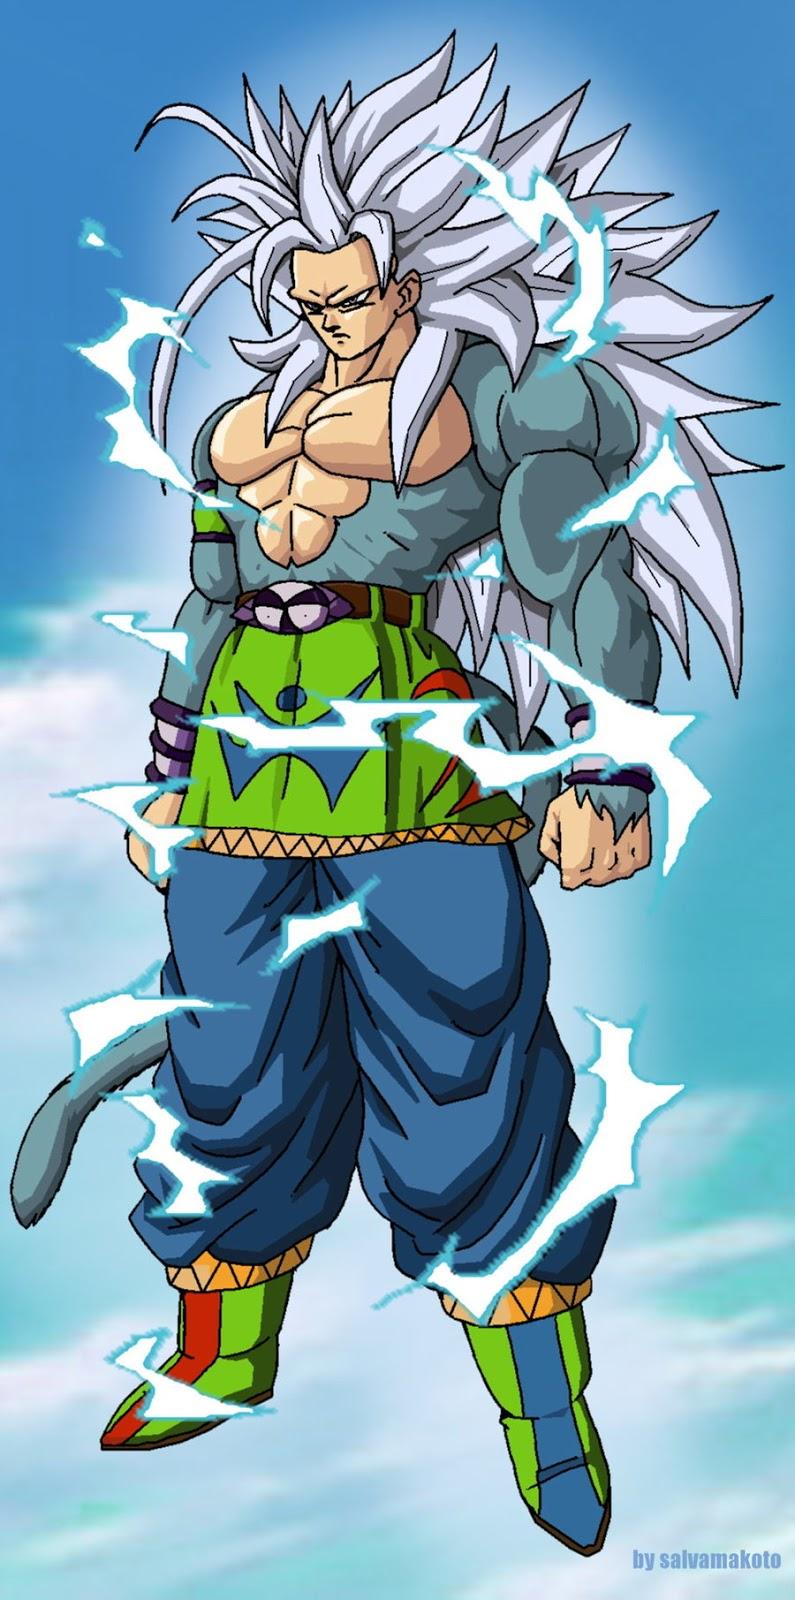 4simplex goku ssj 5 - Goku vs vegeta super saiyan 5 ...